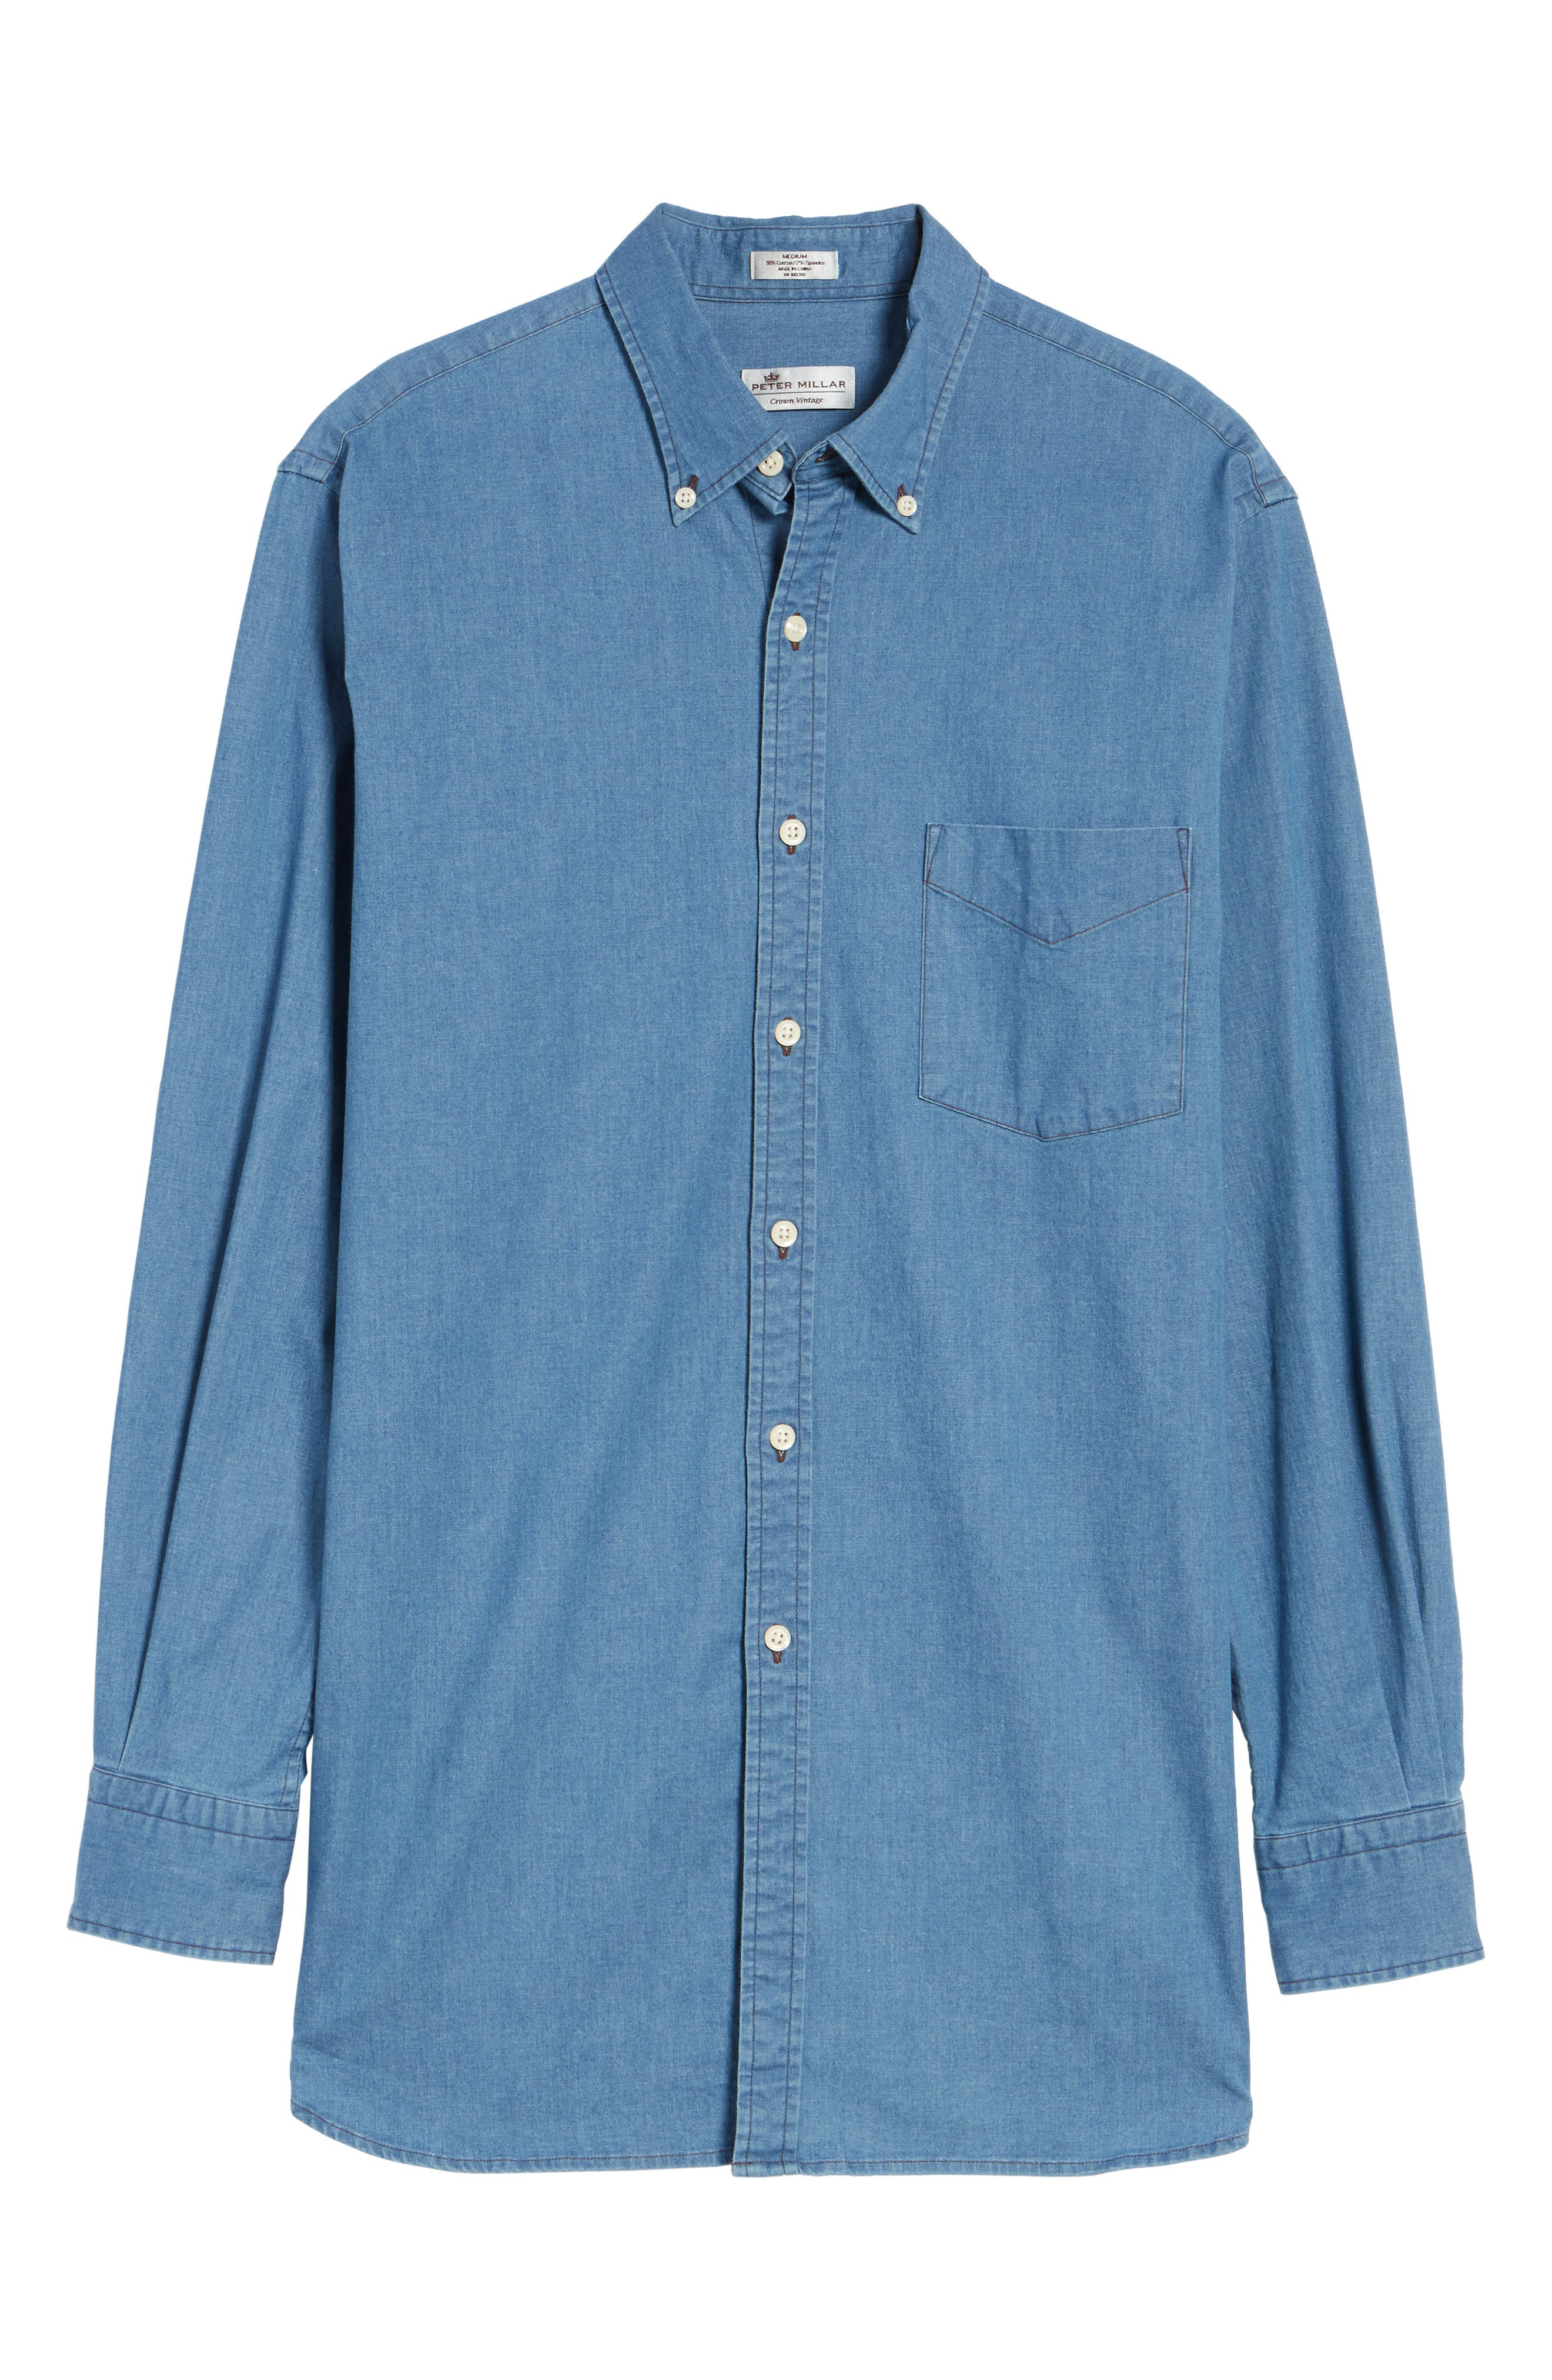 Crown Vintage Regular Fit Denim Sport Shirt,                             Alternate thumbnail 6, color,